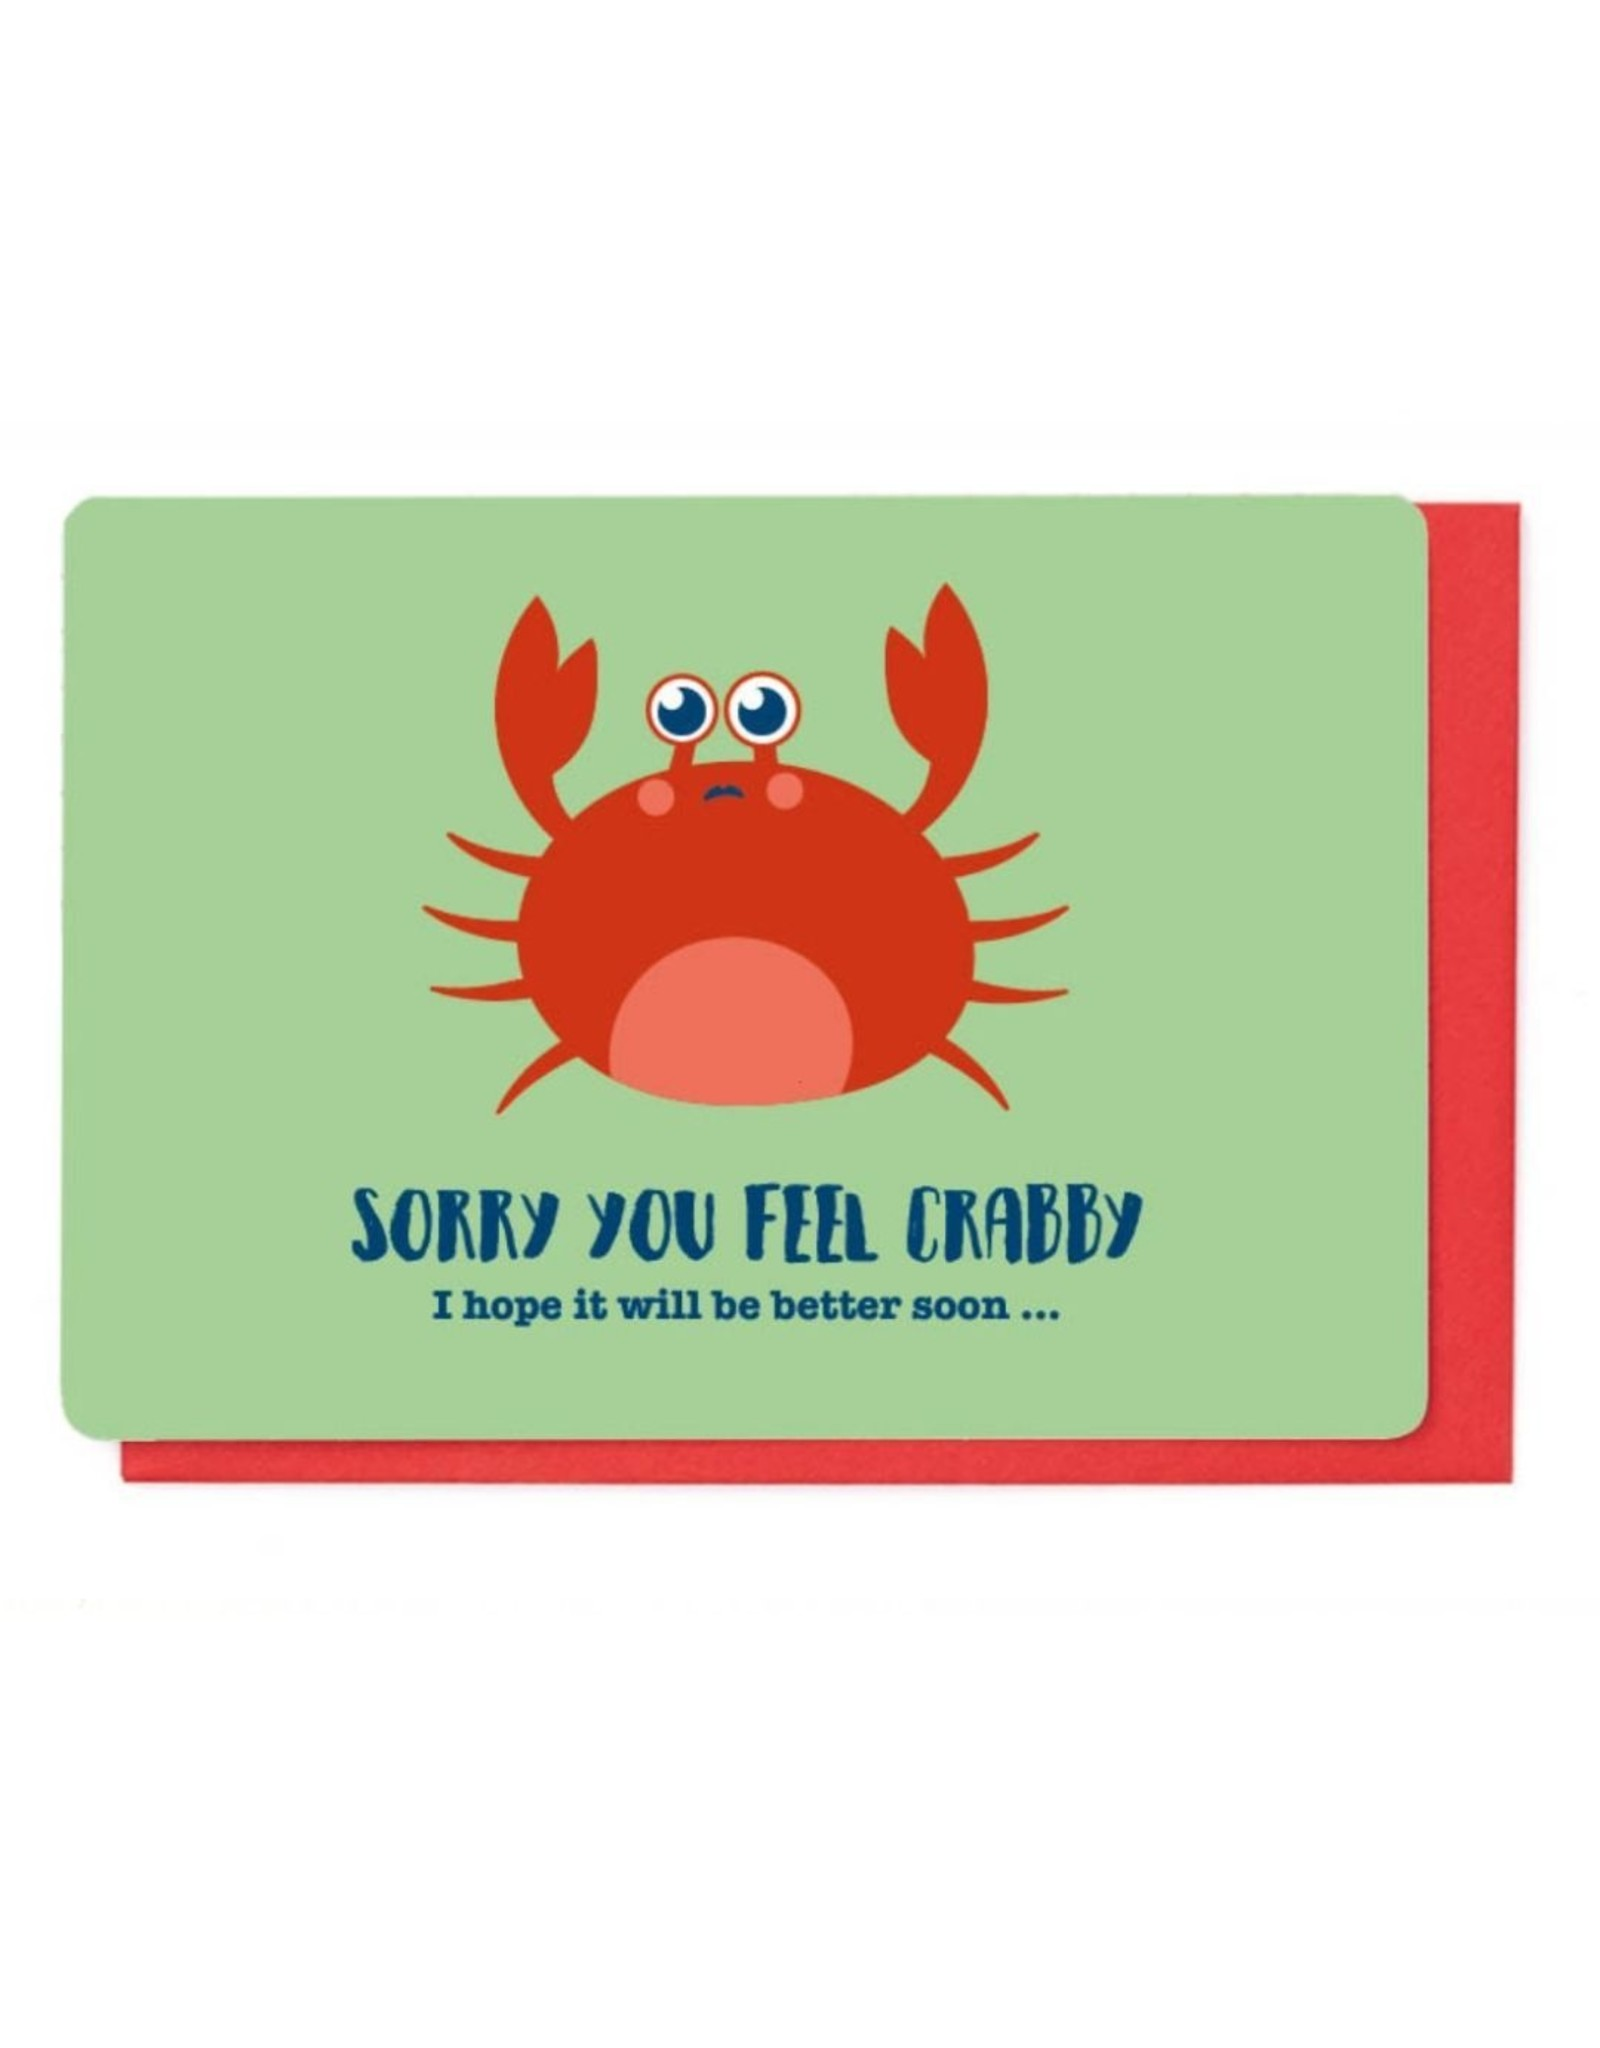 Enfant Terrible Wenskaart - Sorry you feel Crabby